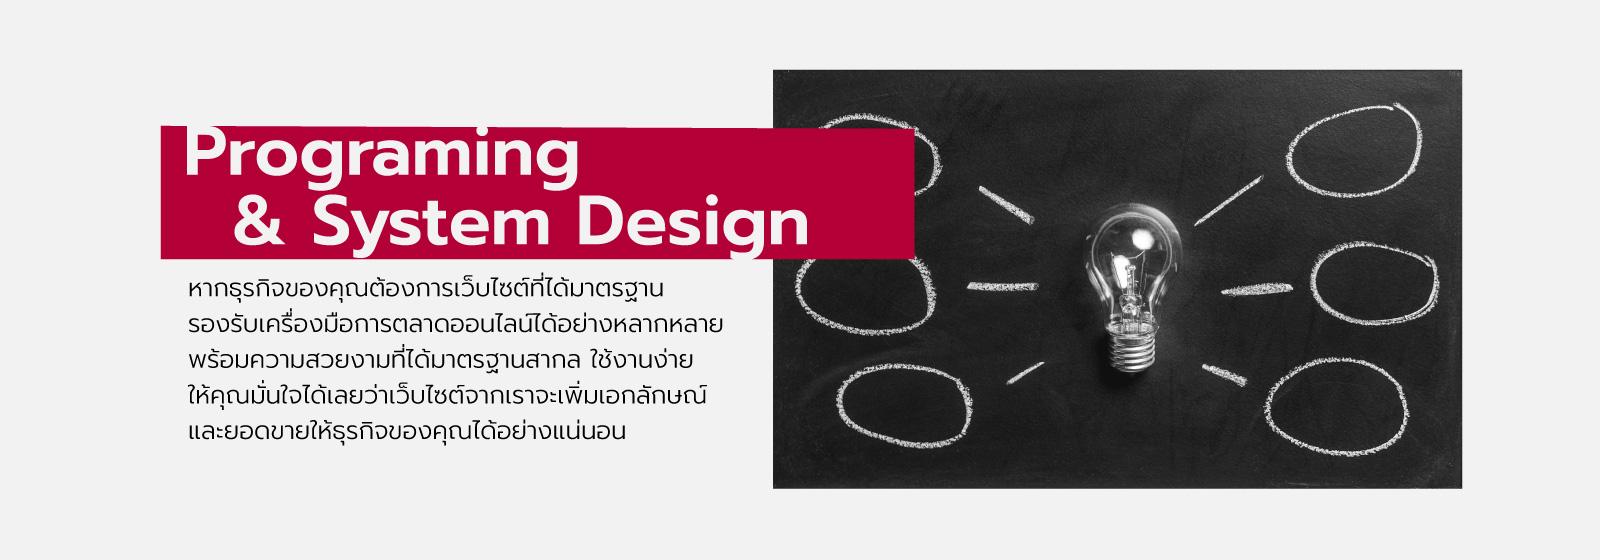 Programing & System Design